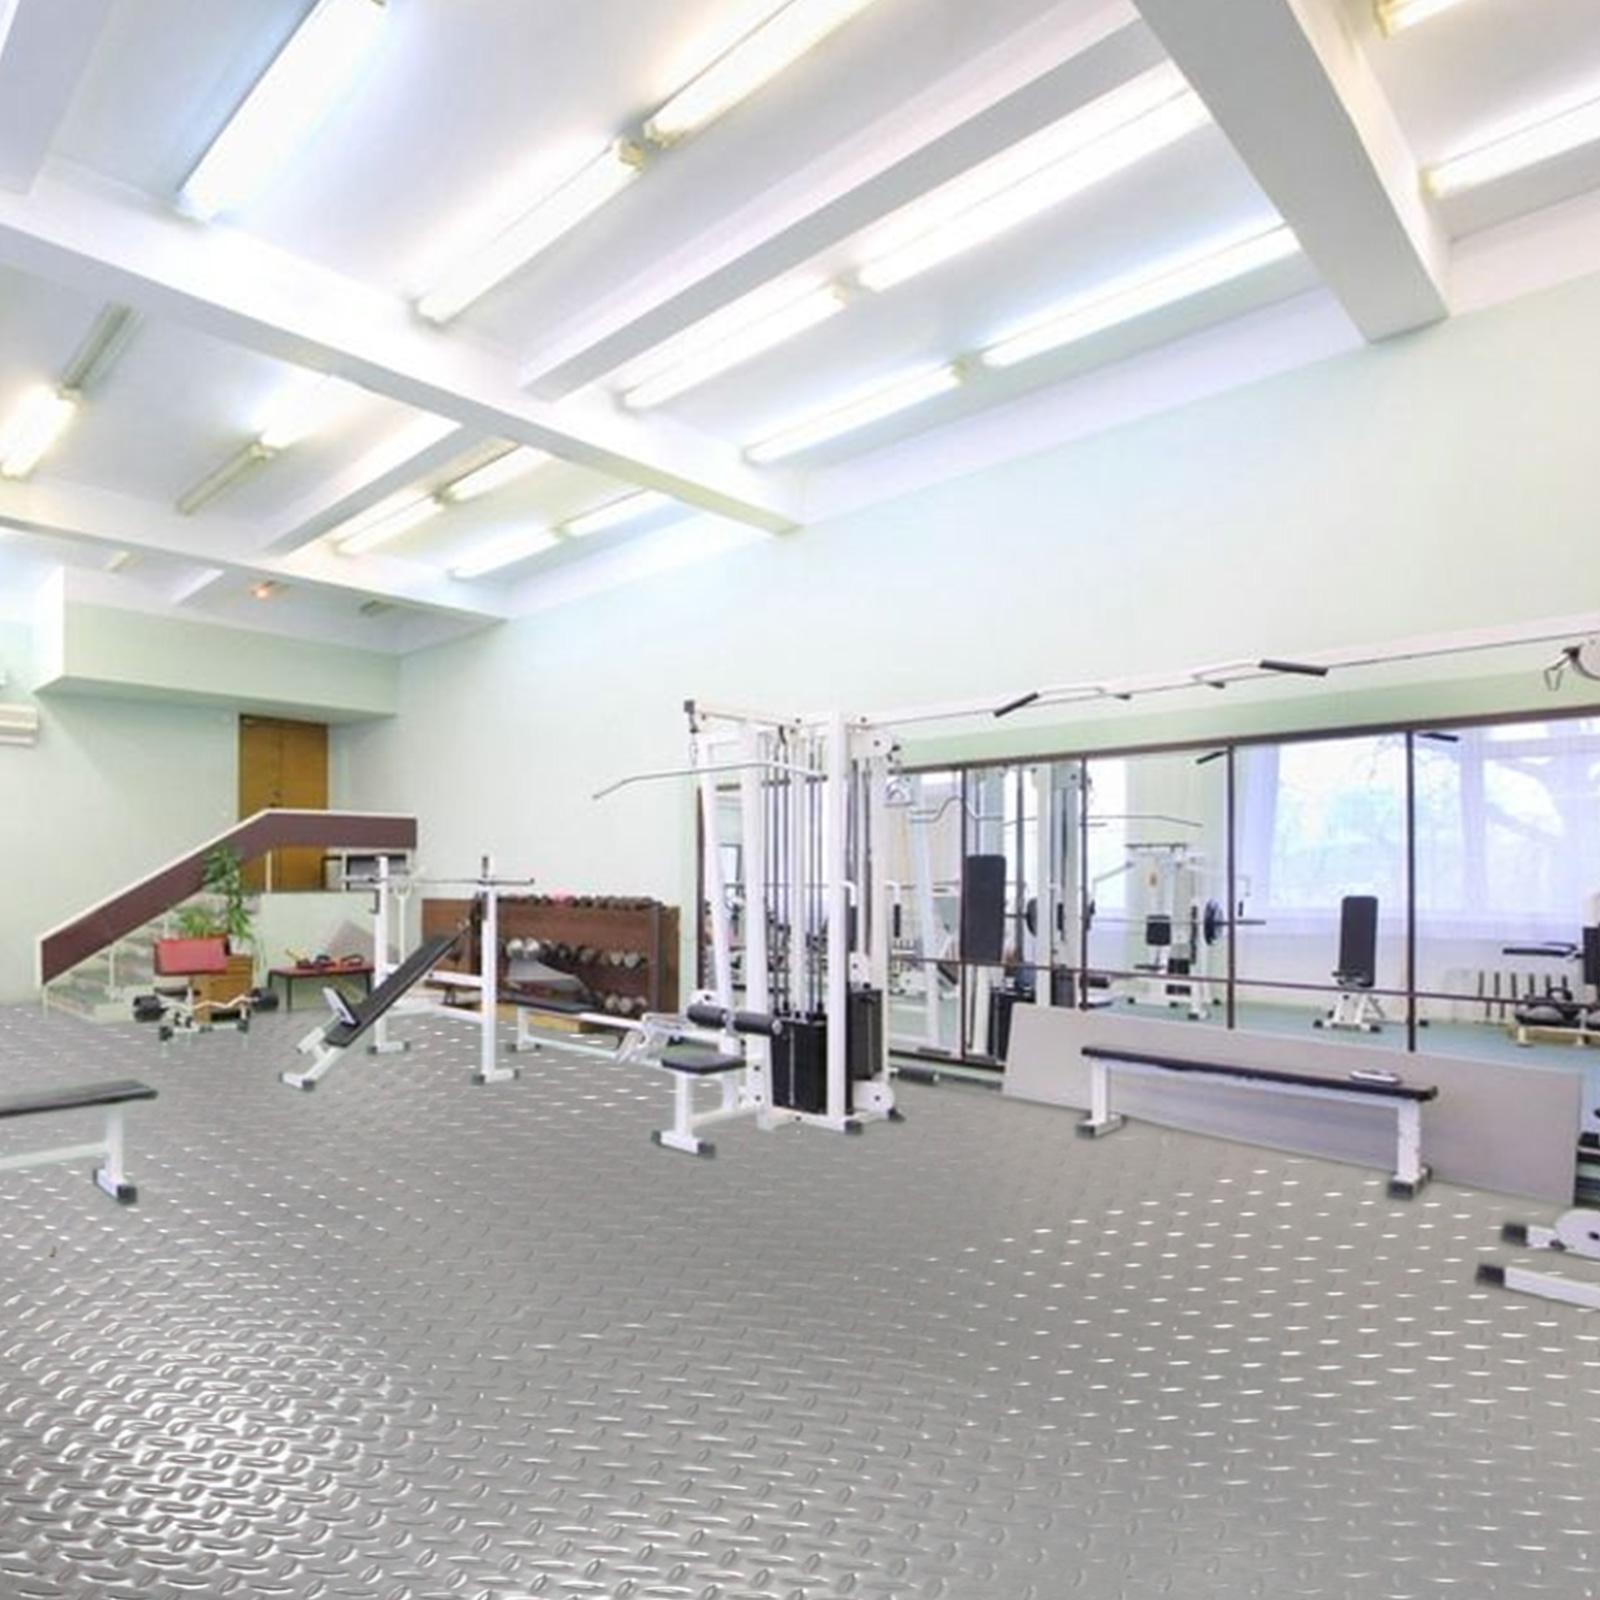 thumbnail 58 - Garage Flooring Mat Roll Car Trailer Floor Covering 1.1m Width Gym Floor Roll